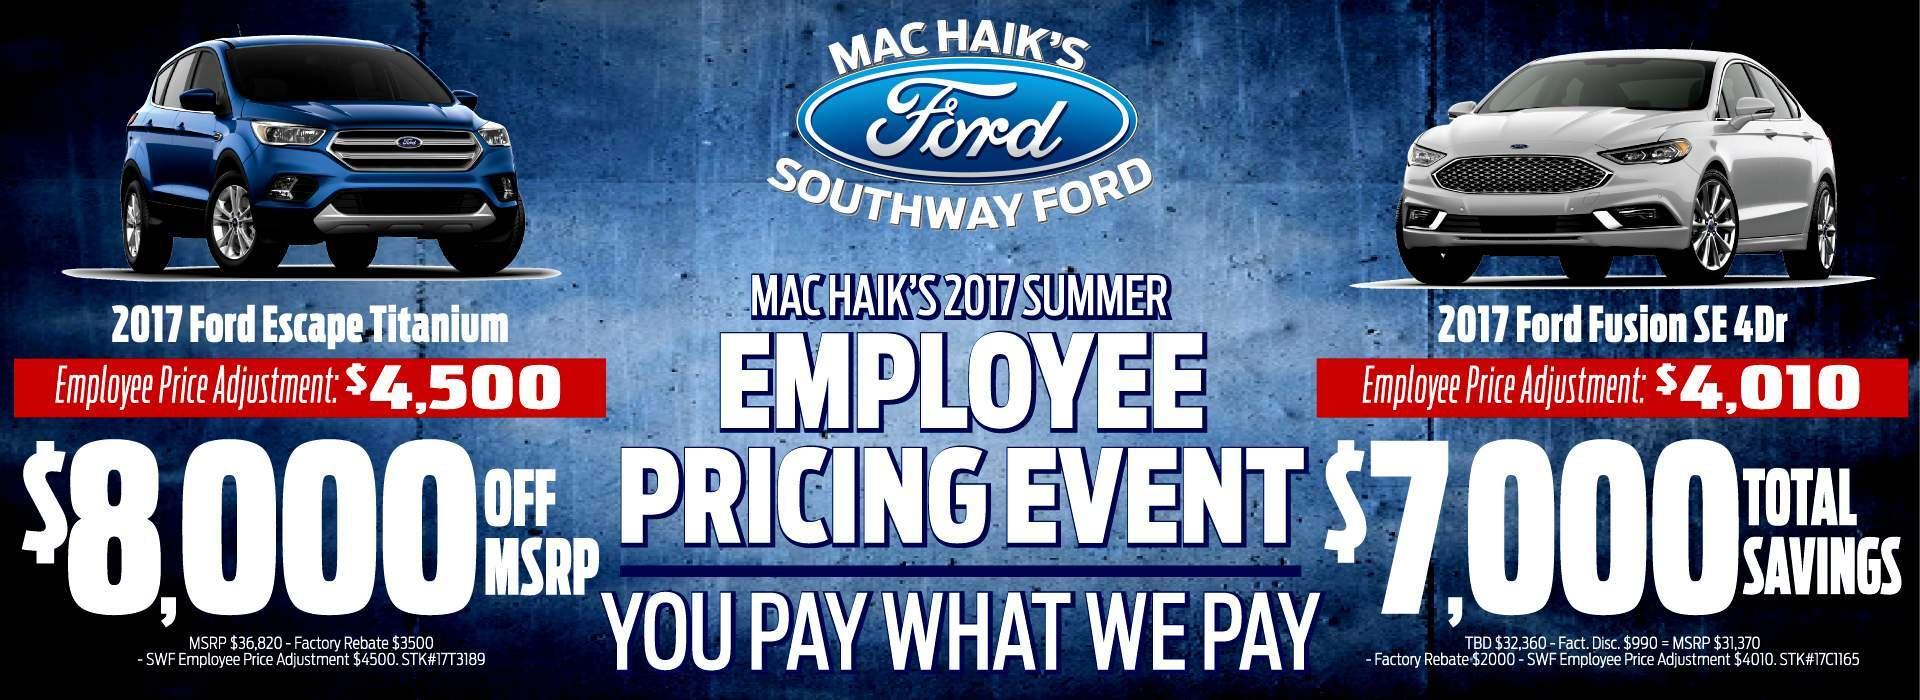 Ford Dealership San Antonio TX Used Cars Mac Haik Southway